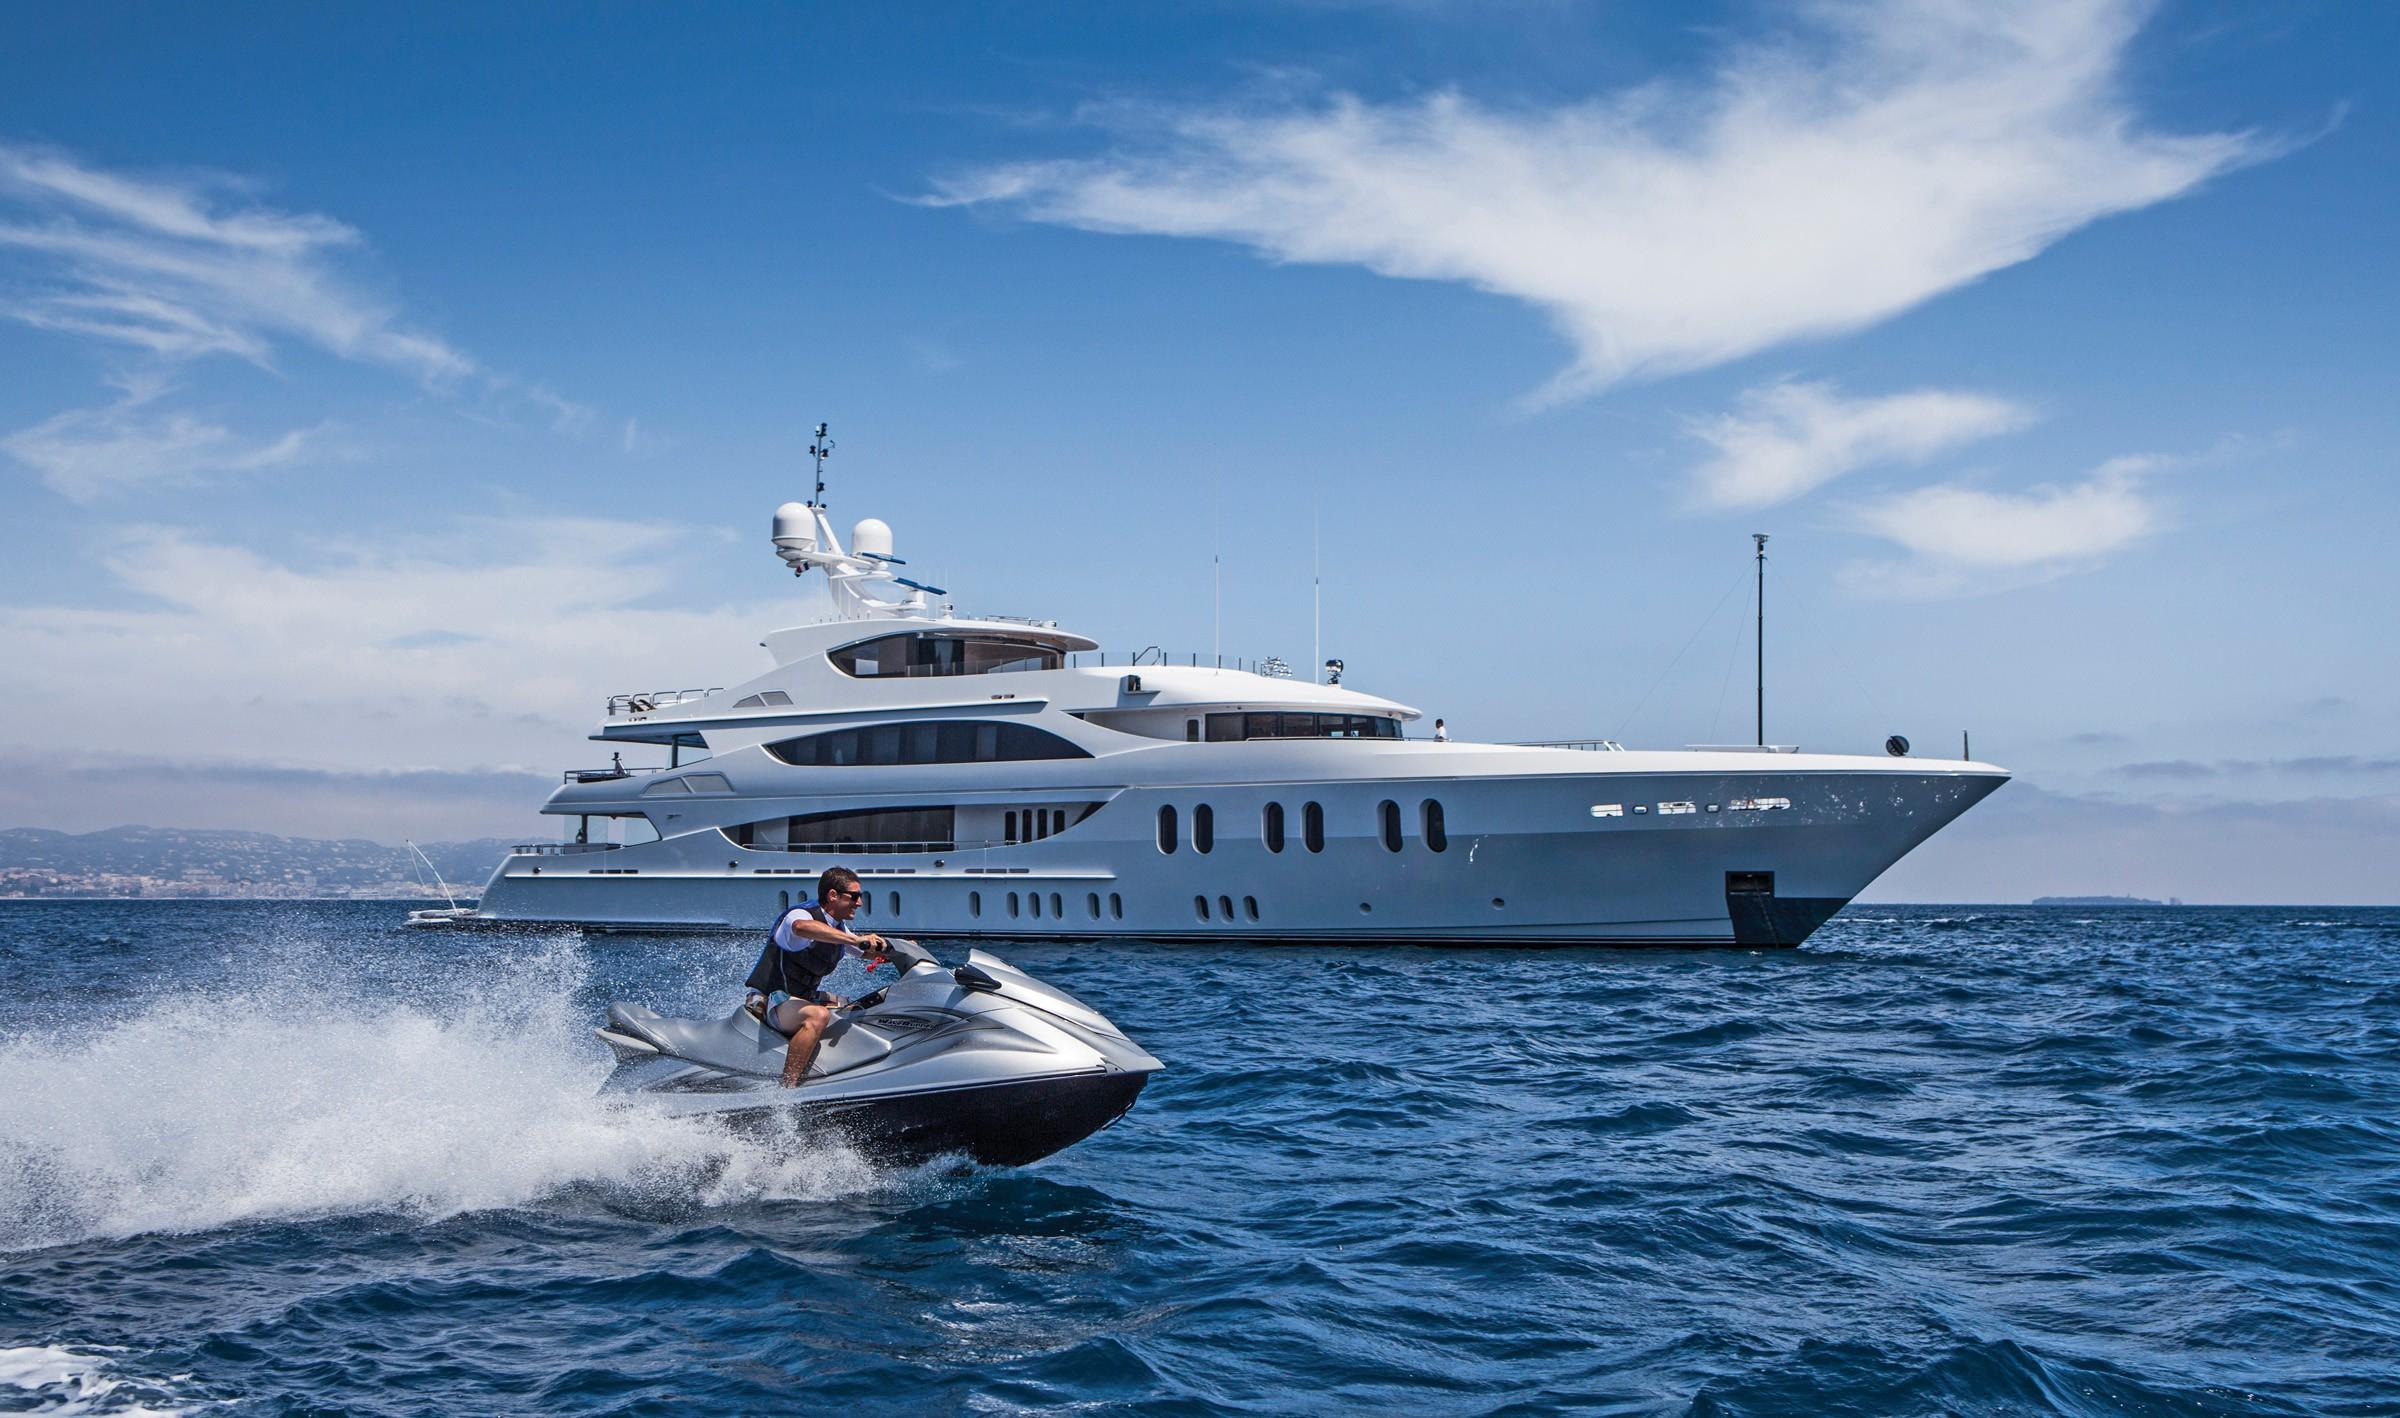 57m motor yacht by Trinity Yachts